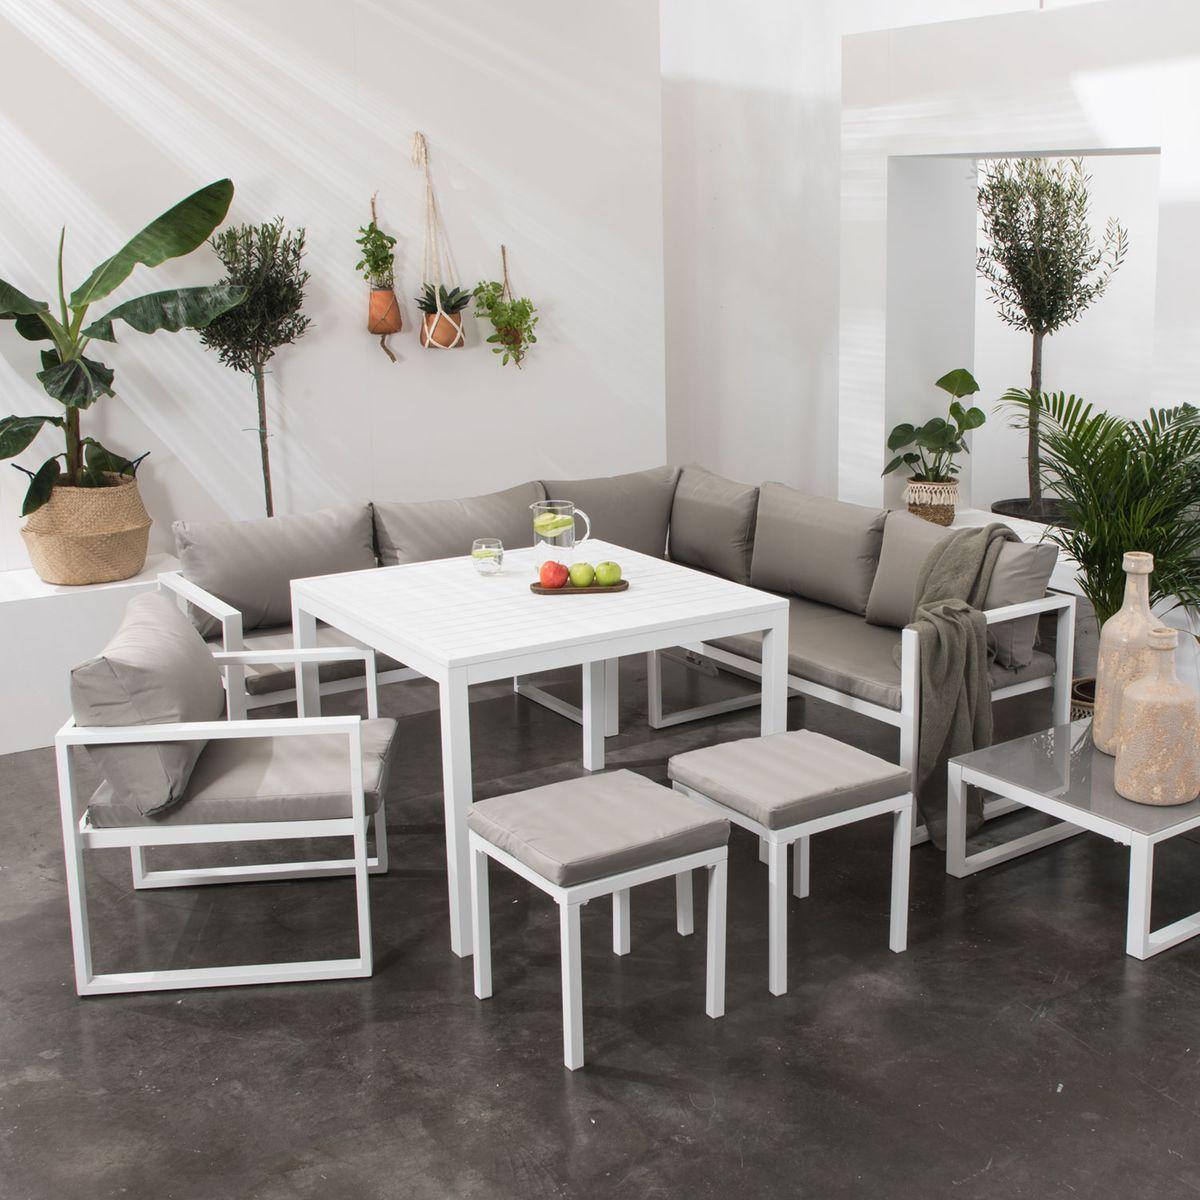 Salon De Jardin Ibiza 7 Places Taille 6 Pers Products